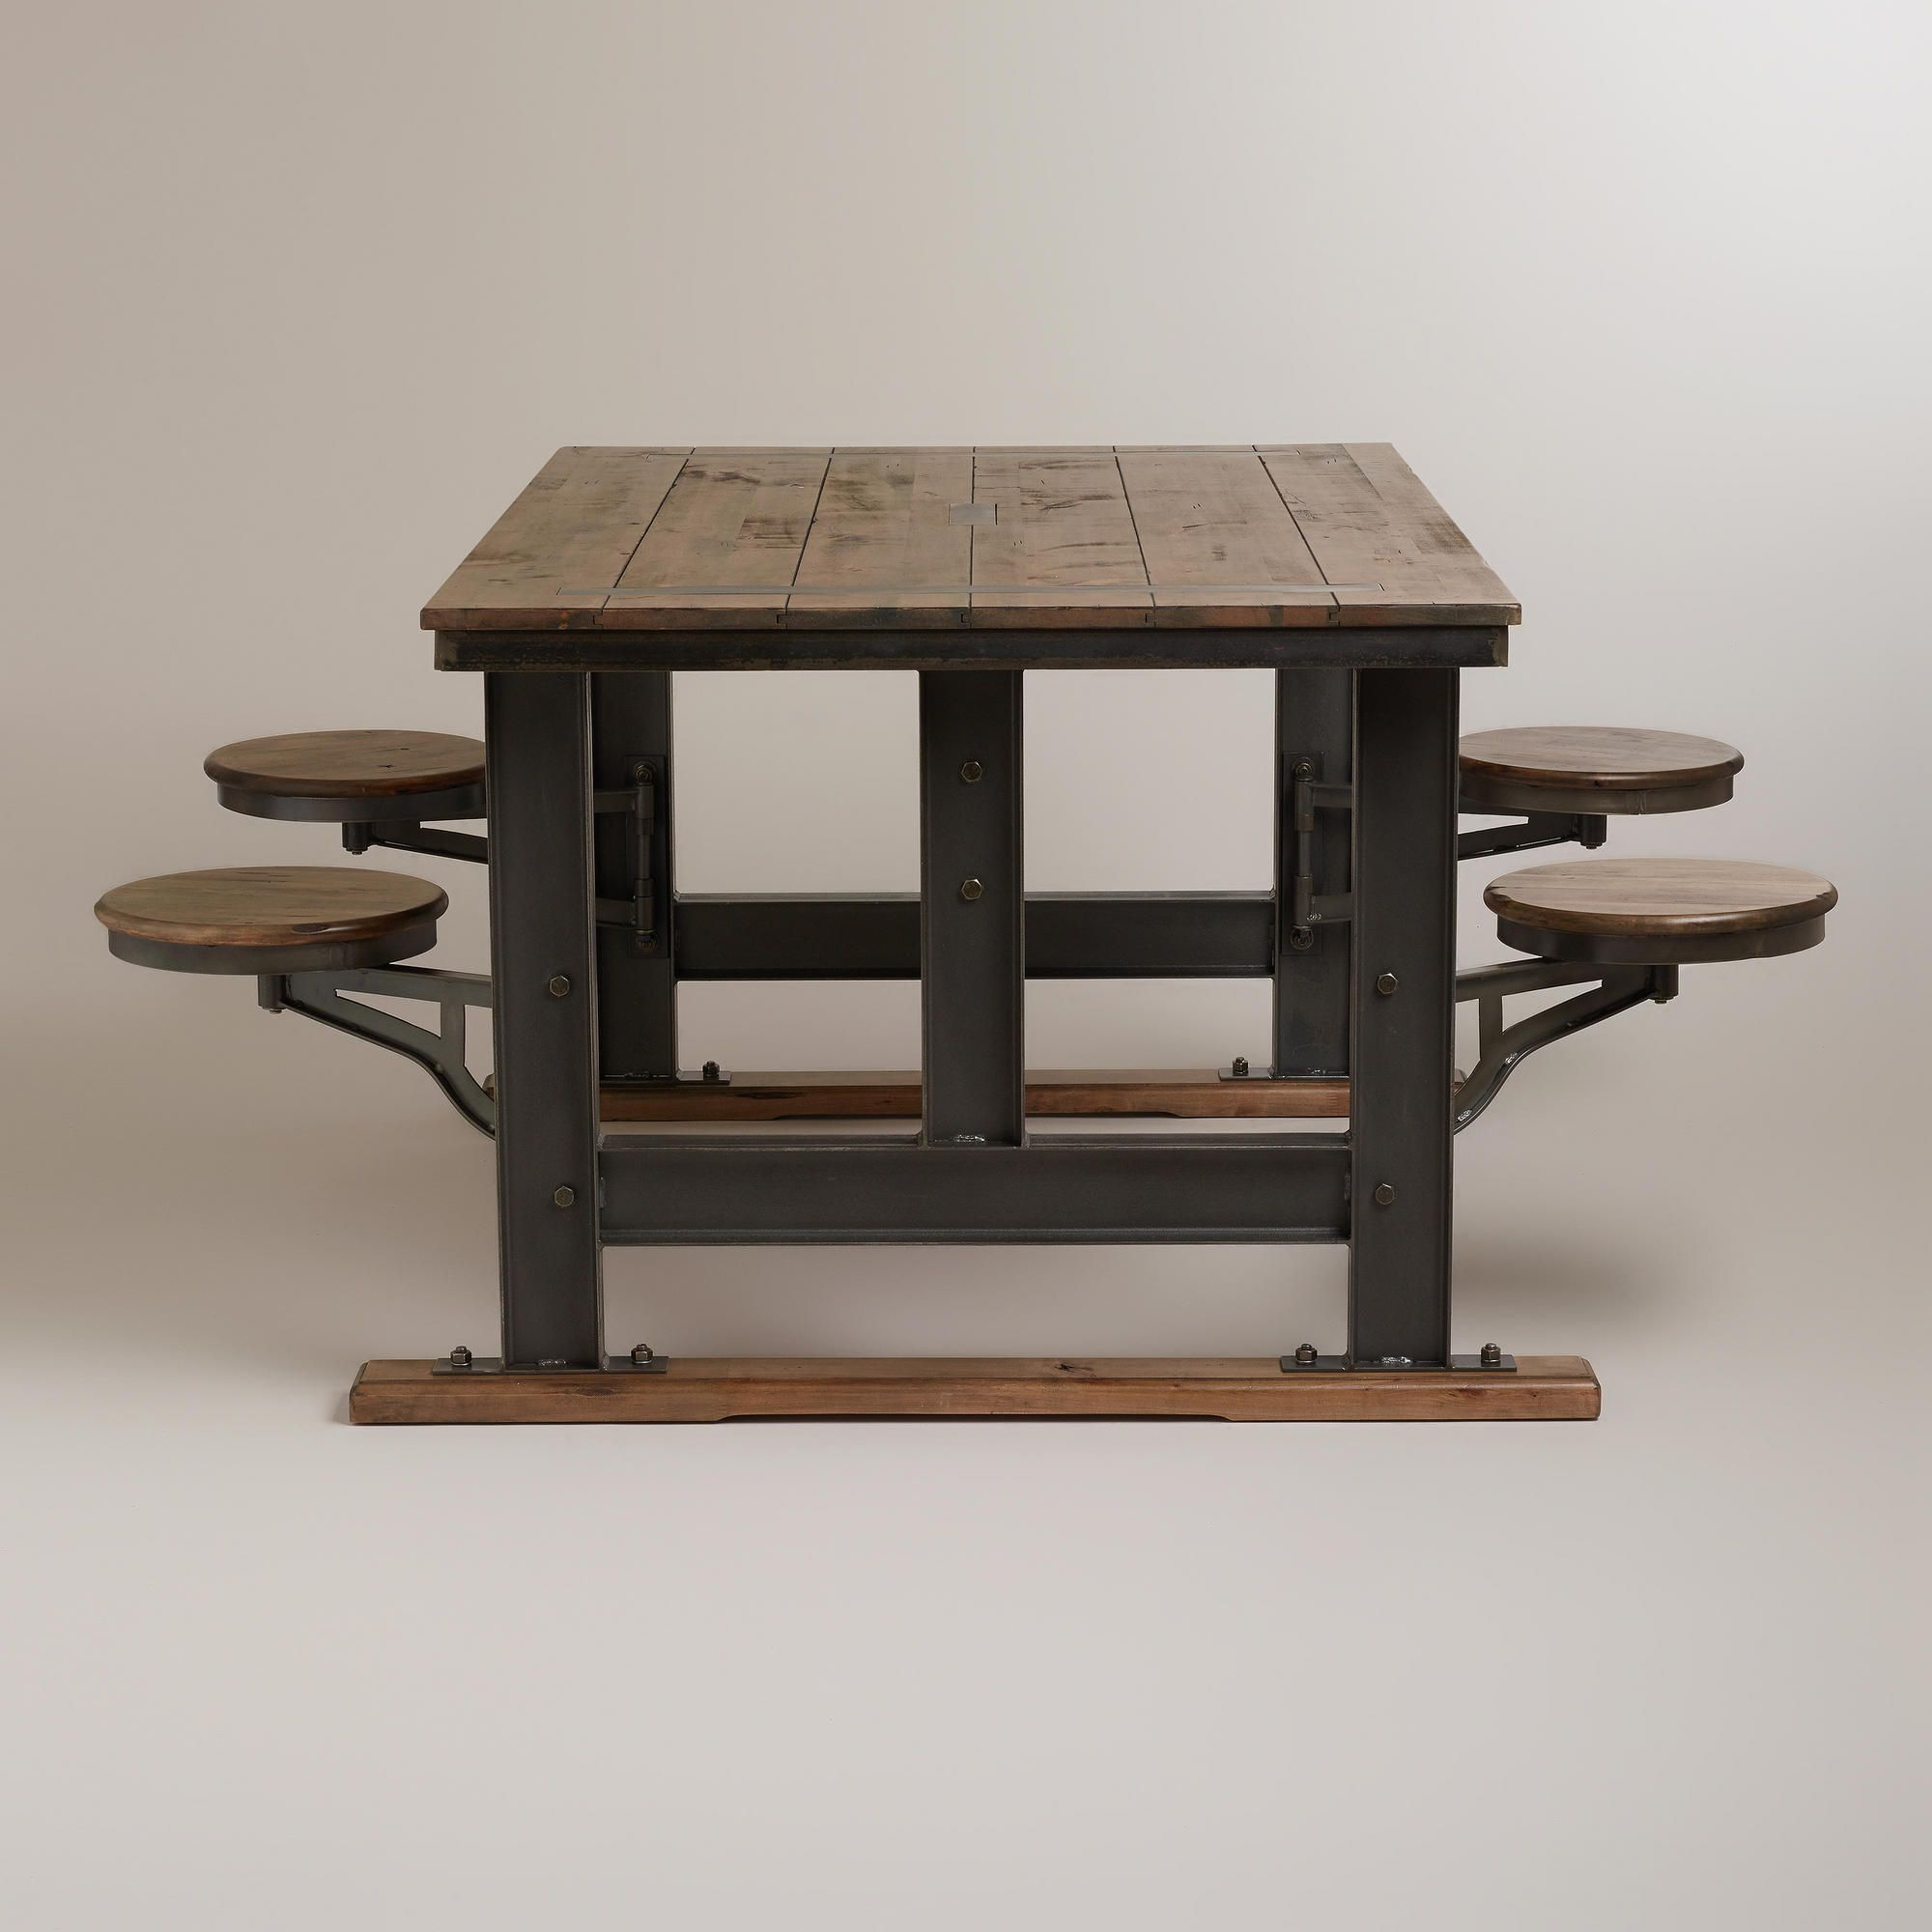 Galvin Cafeteria Table Cafeteria Table Furniture Diy Furniture